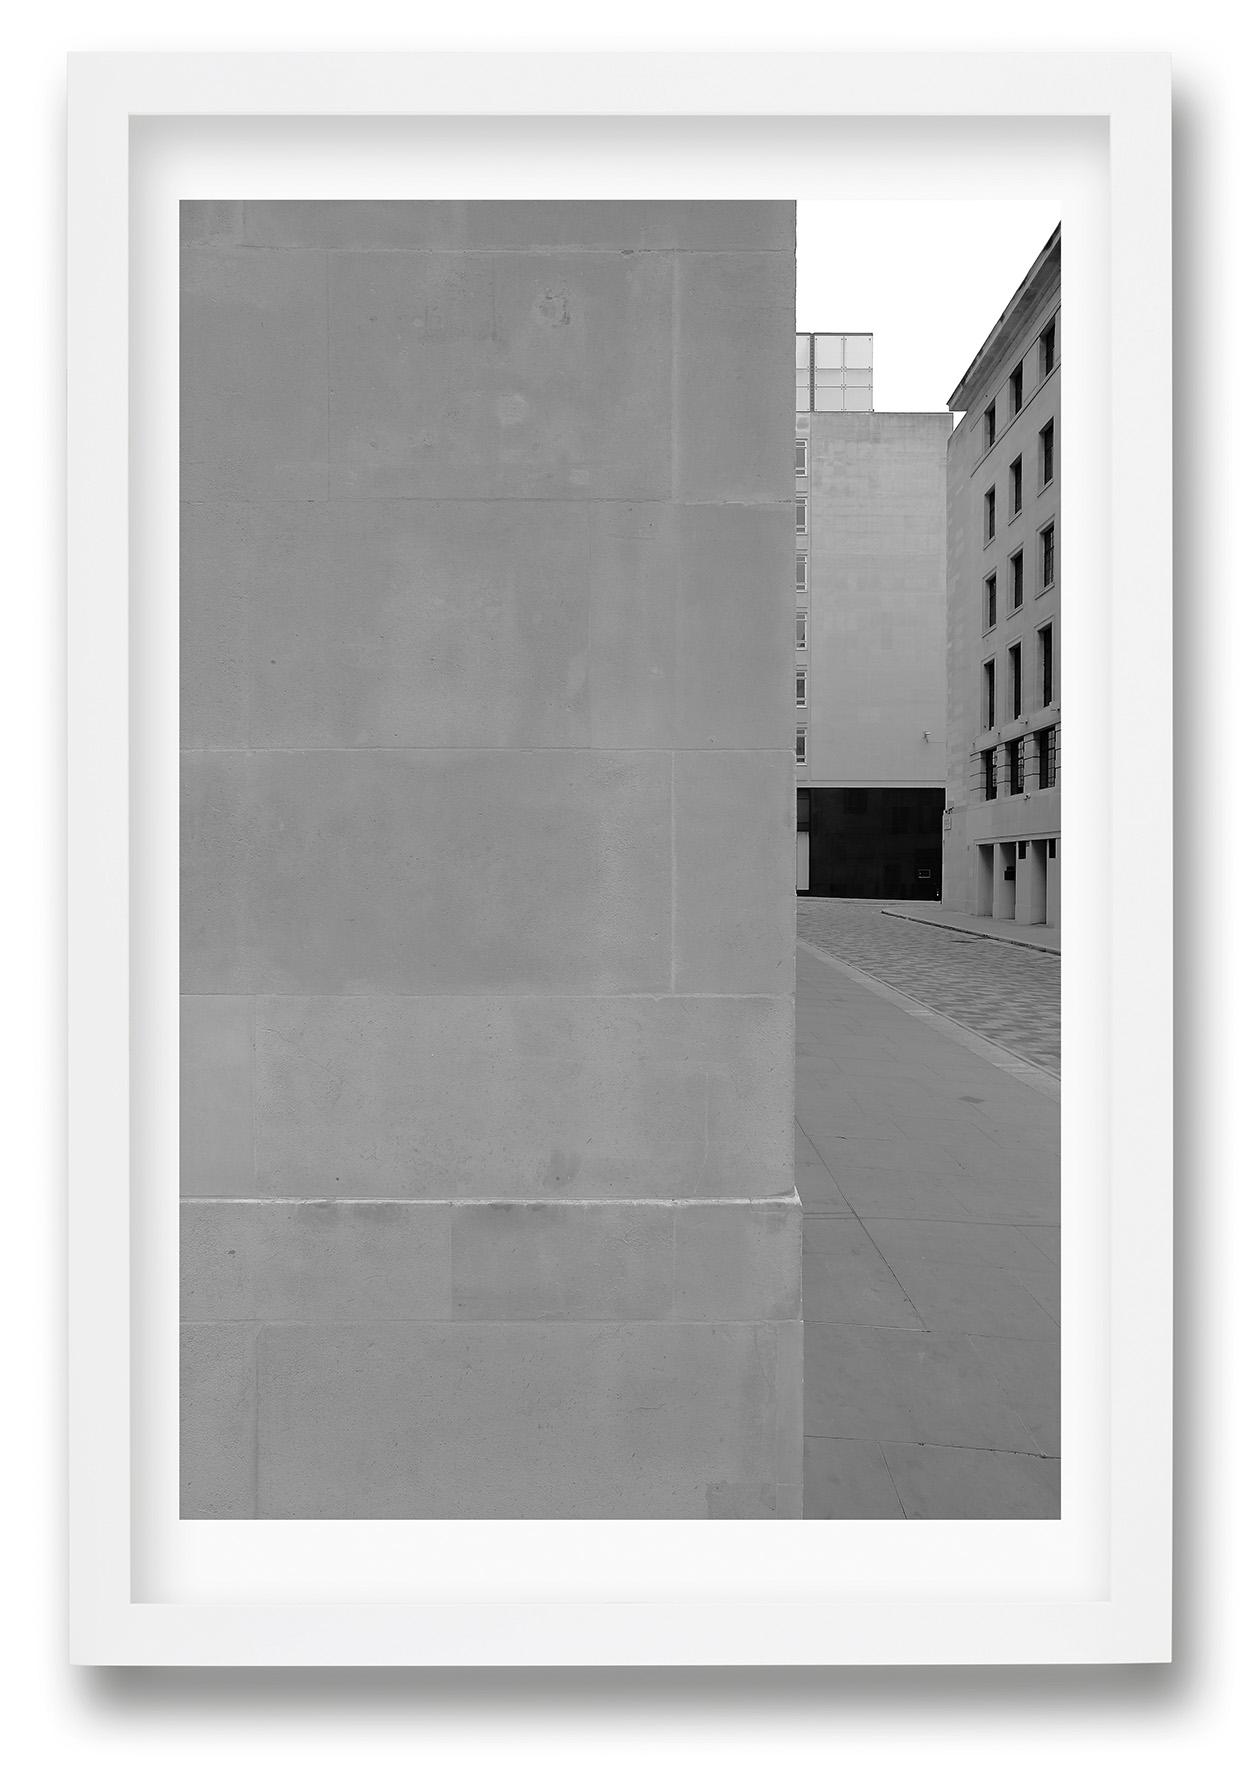 Rahmen_100x150_Hochformat_London_14_9_2017_0030_1